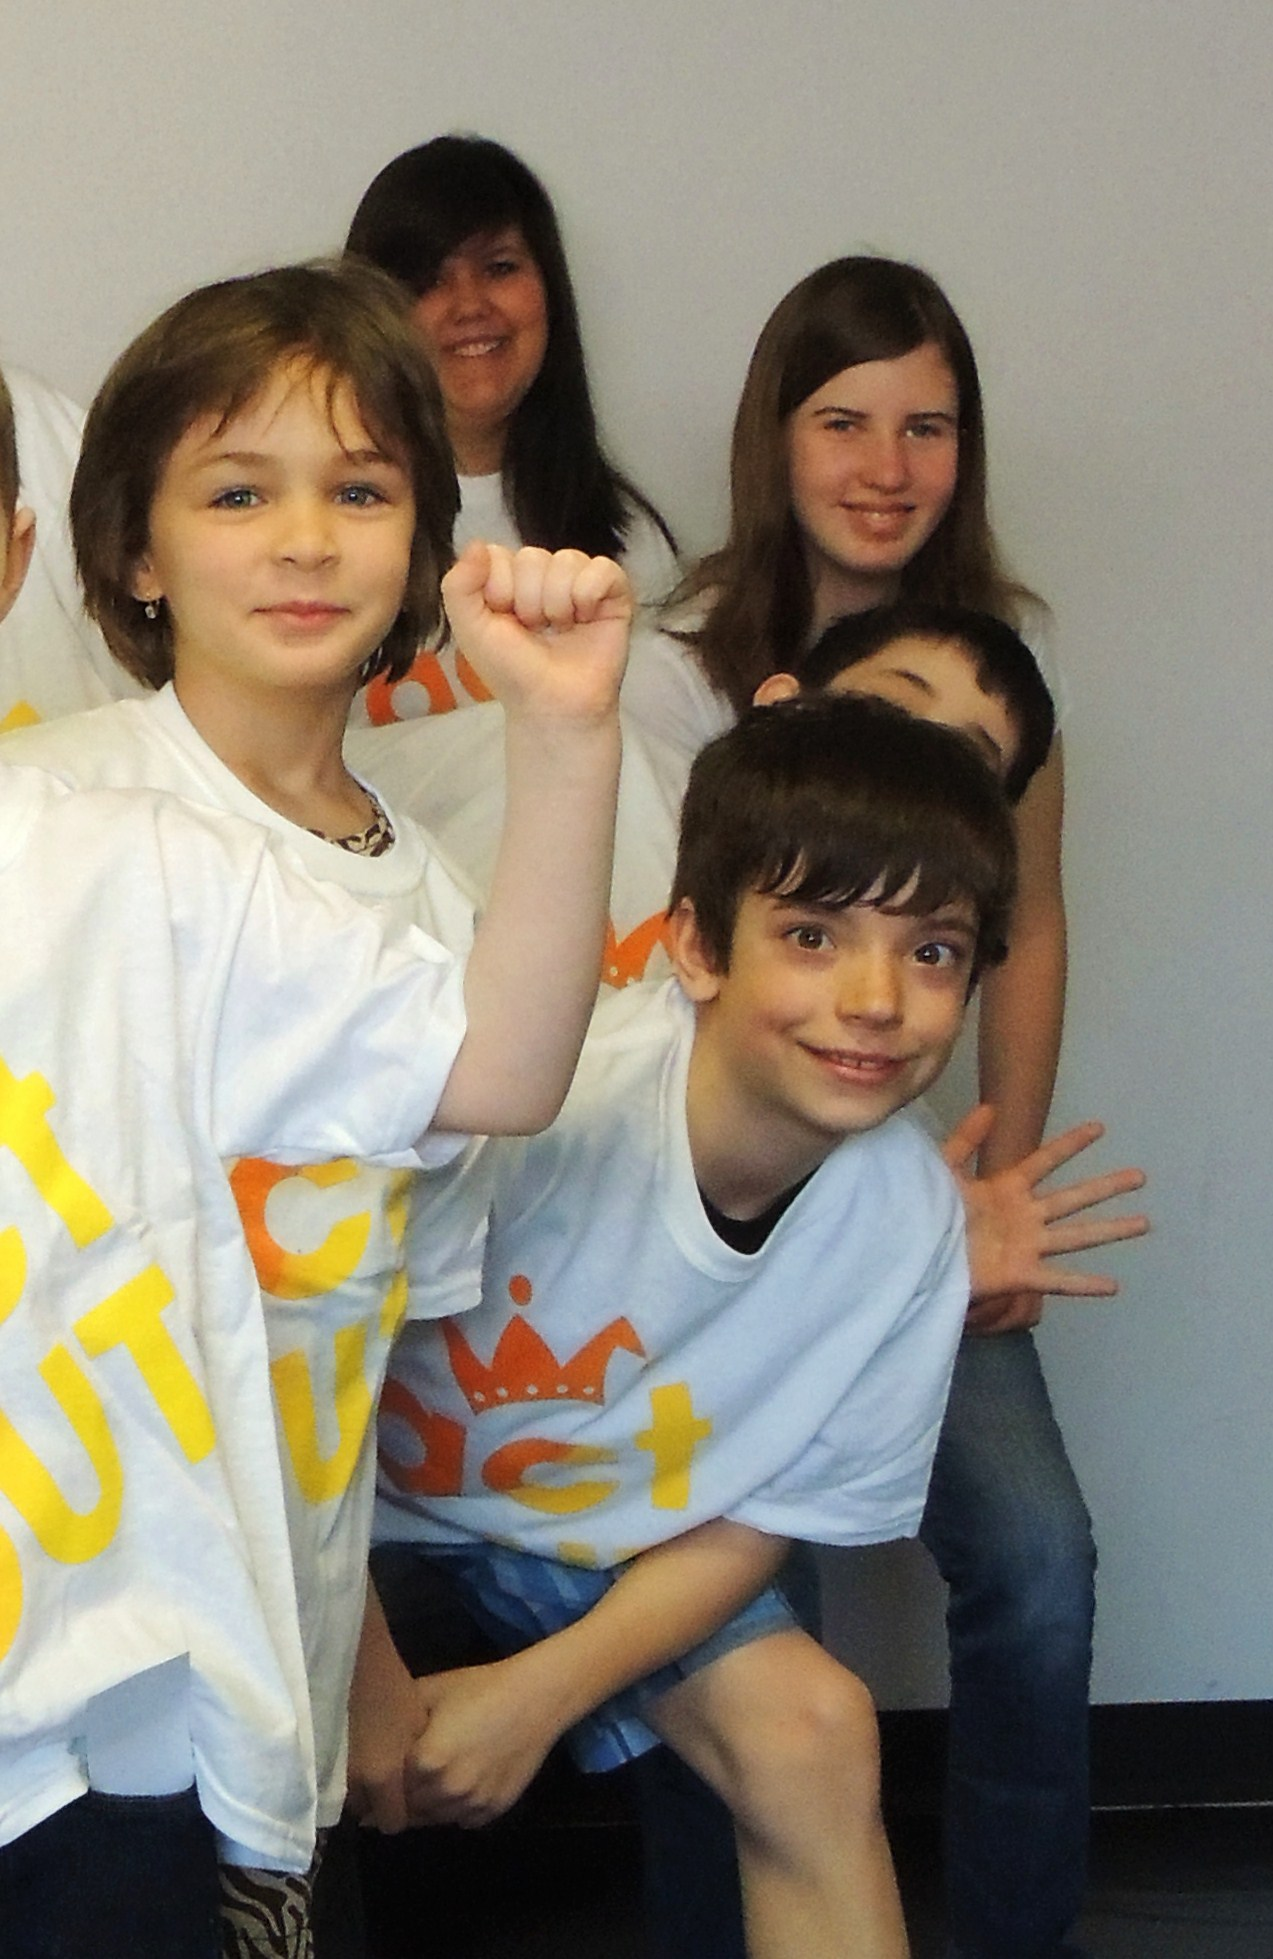 Volunteers helpDrama Campersgain confidence - So they learn skills that last a lifetime!